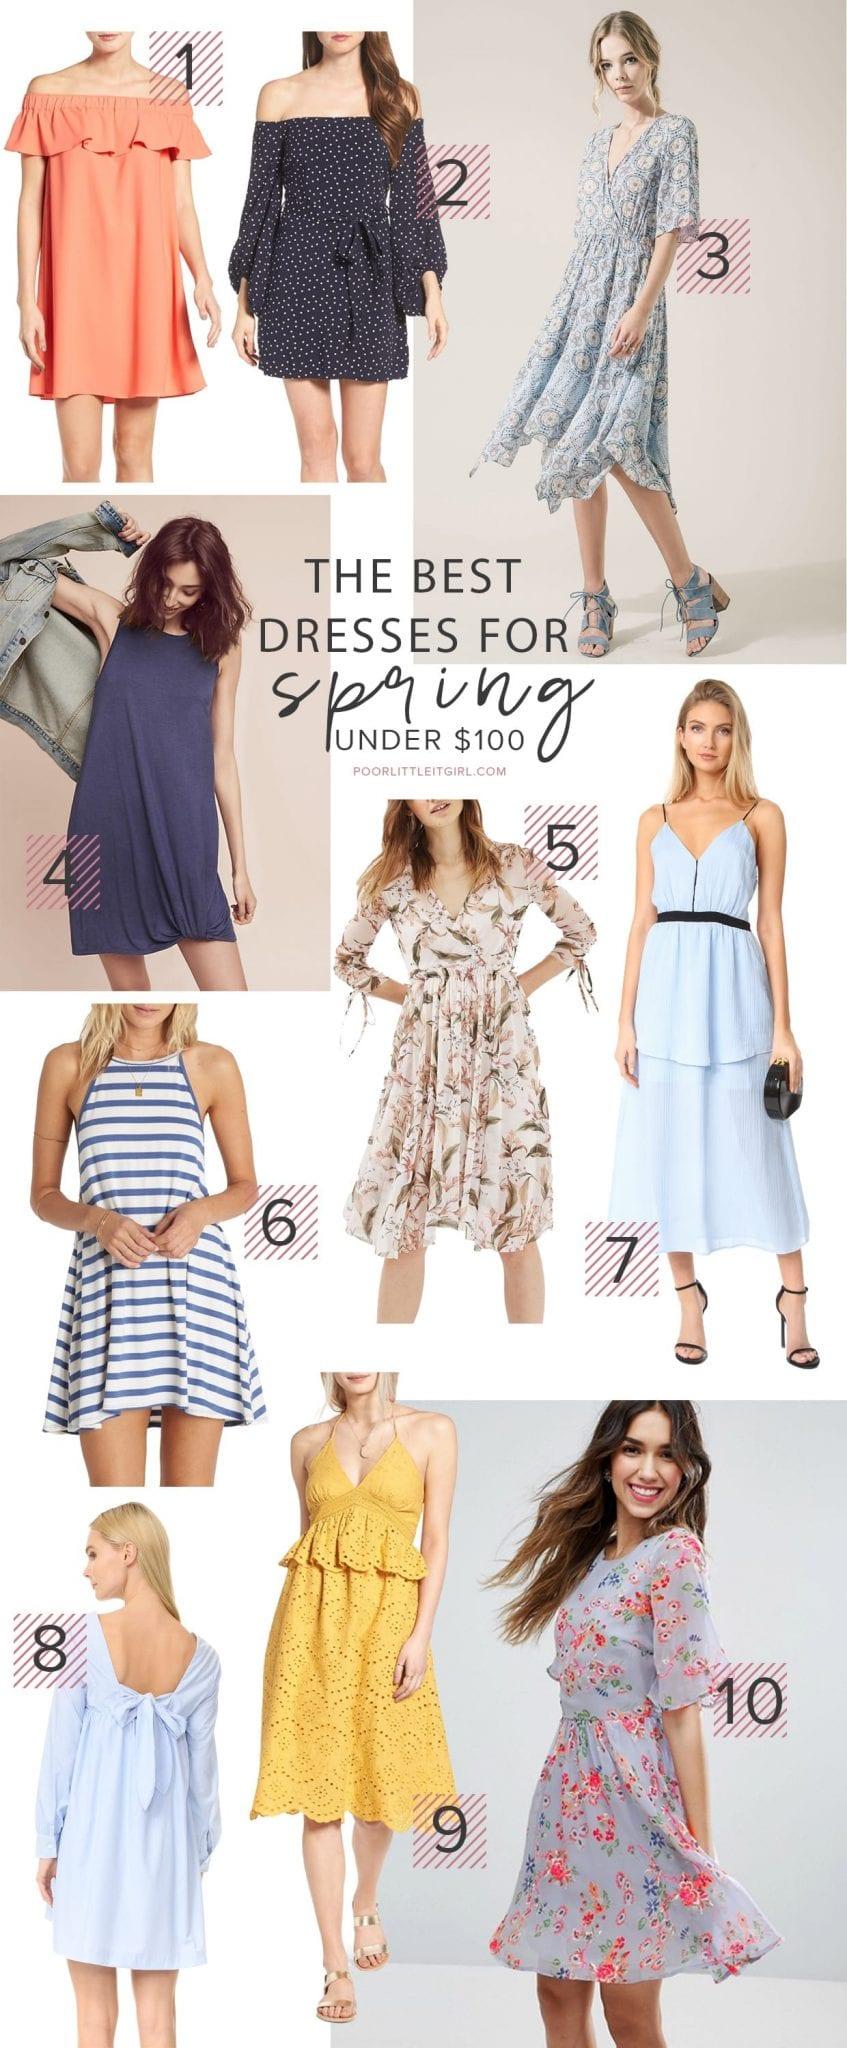 The Best Spring Dresses Under $100 - Poor Little It Girl